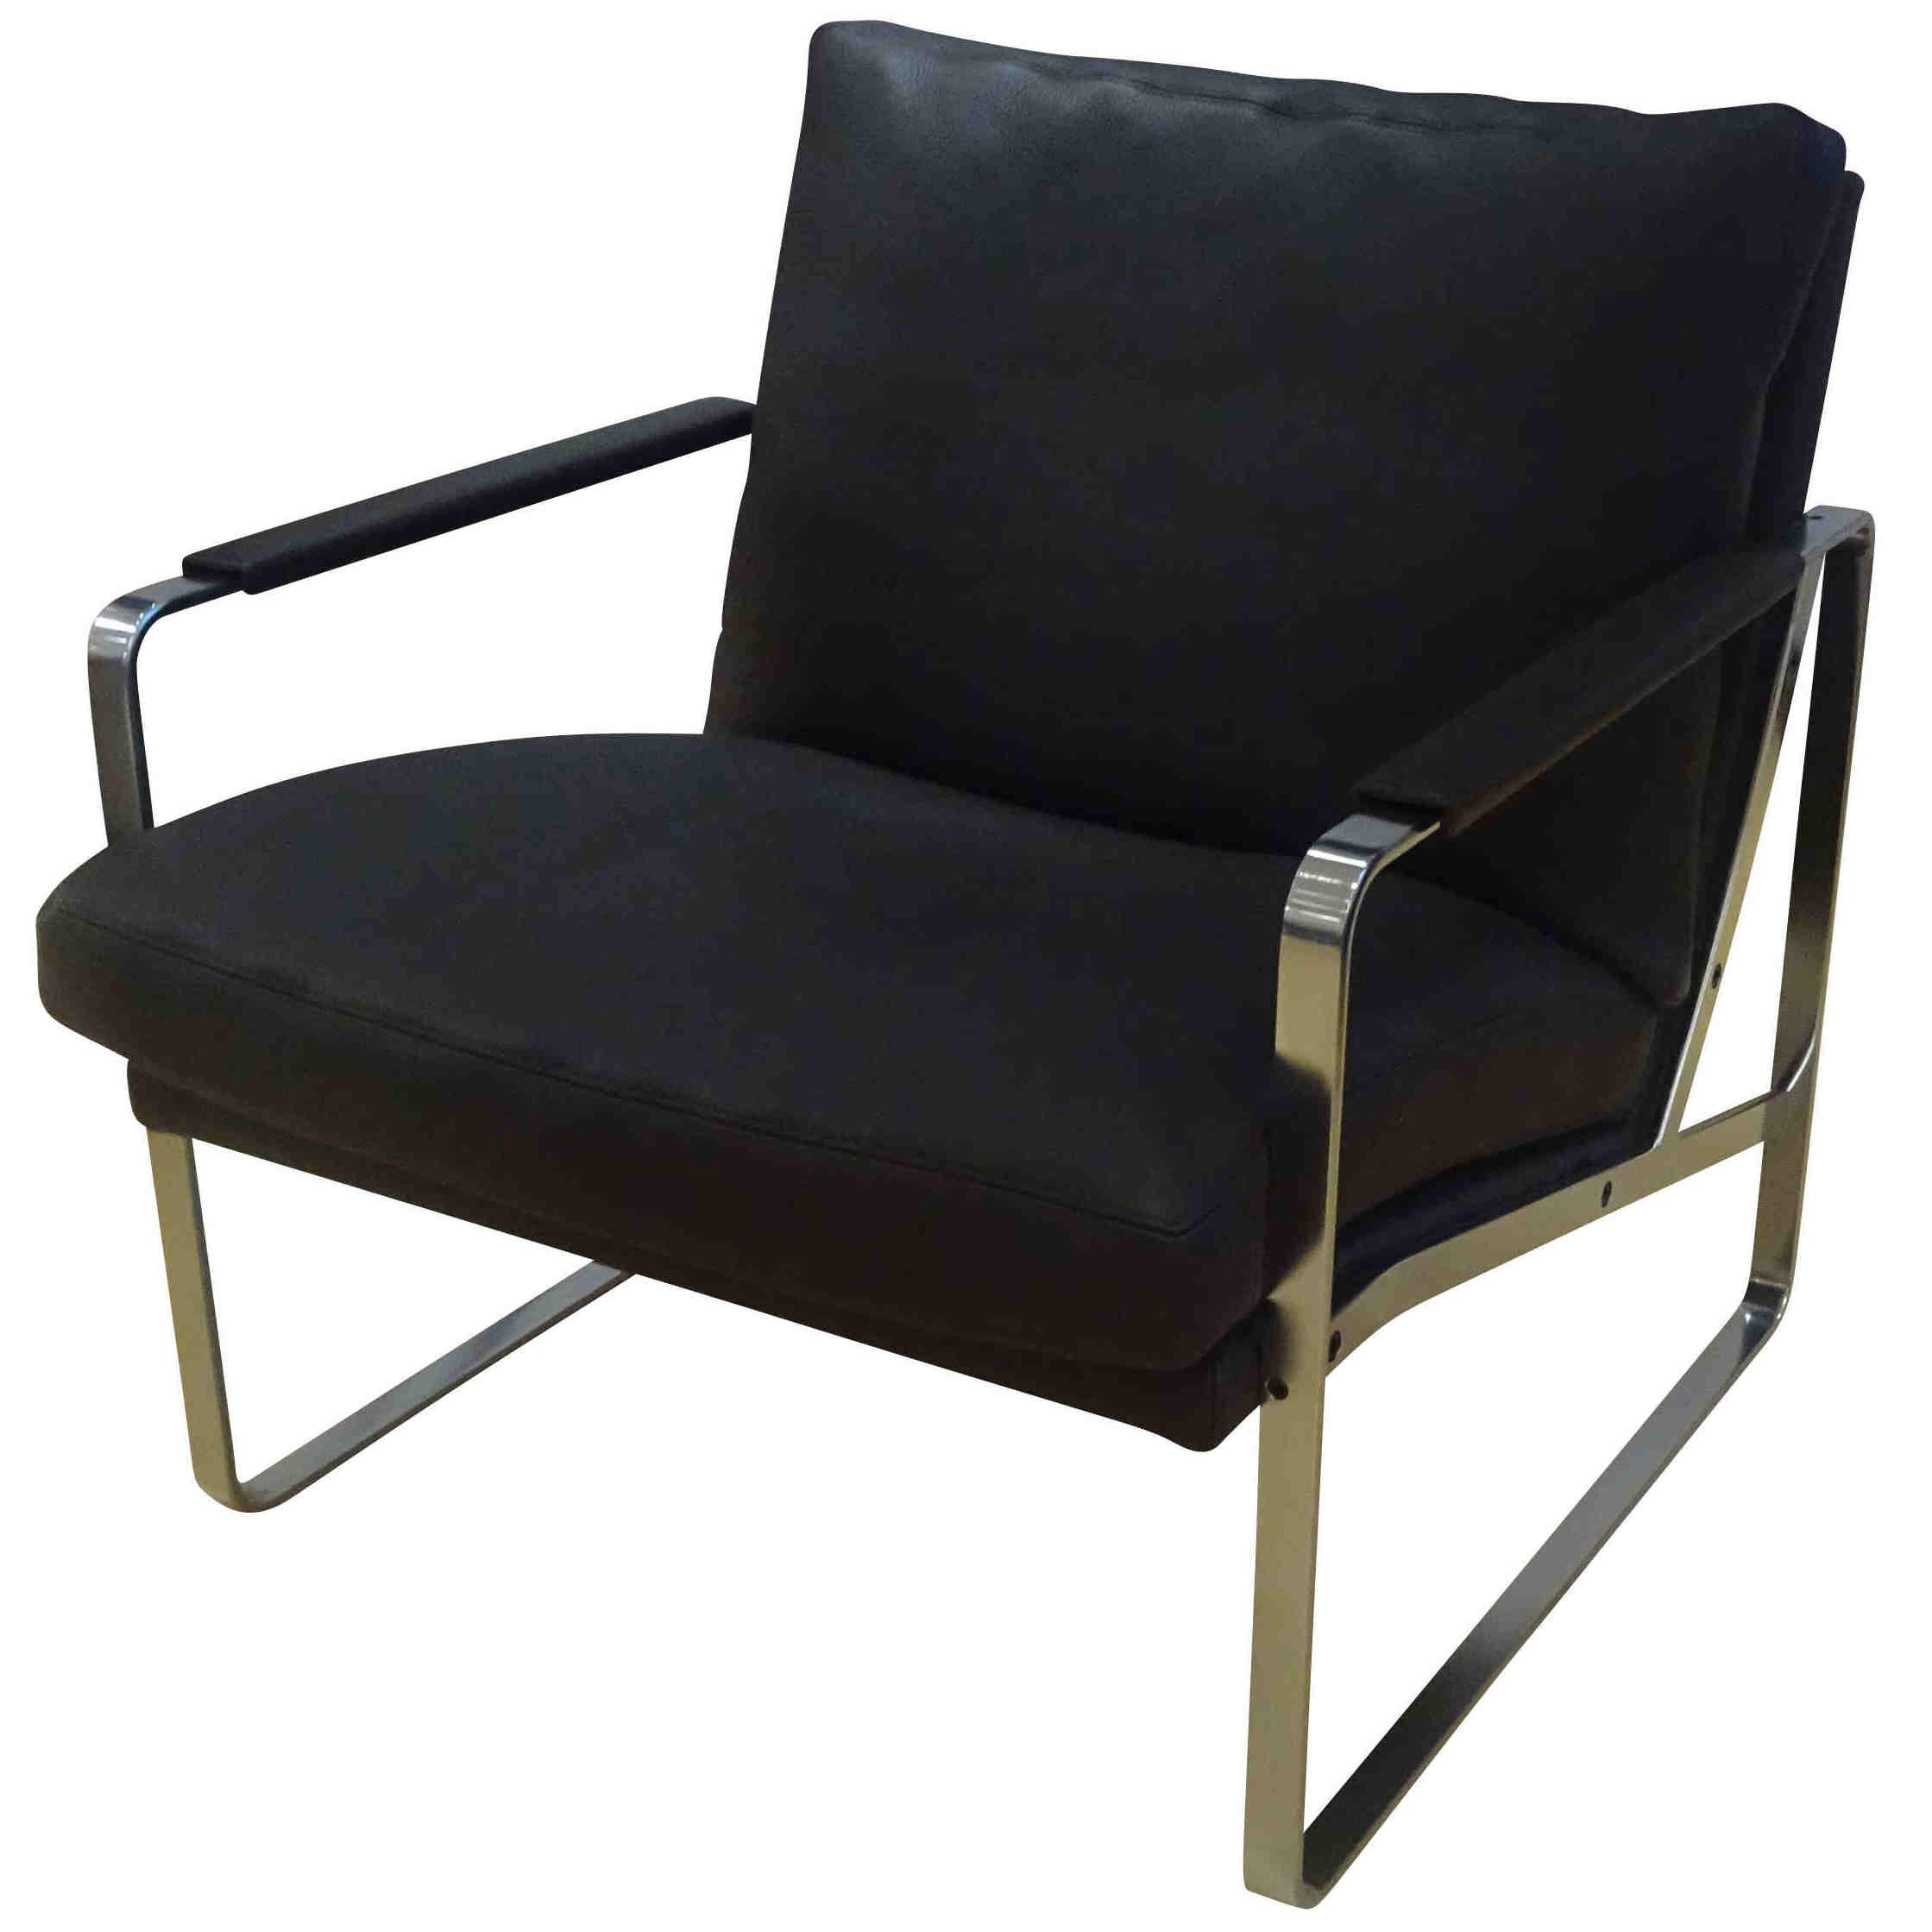 walter knoll designer sessel fabricius leder stahl chrom mokka ebay. Black Bedroom Furniture Sets. Home Design Ideas